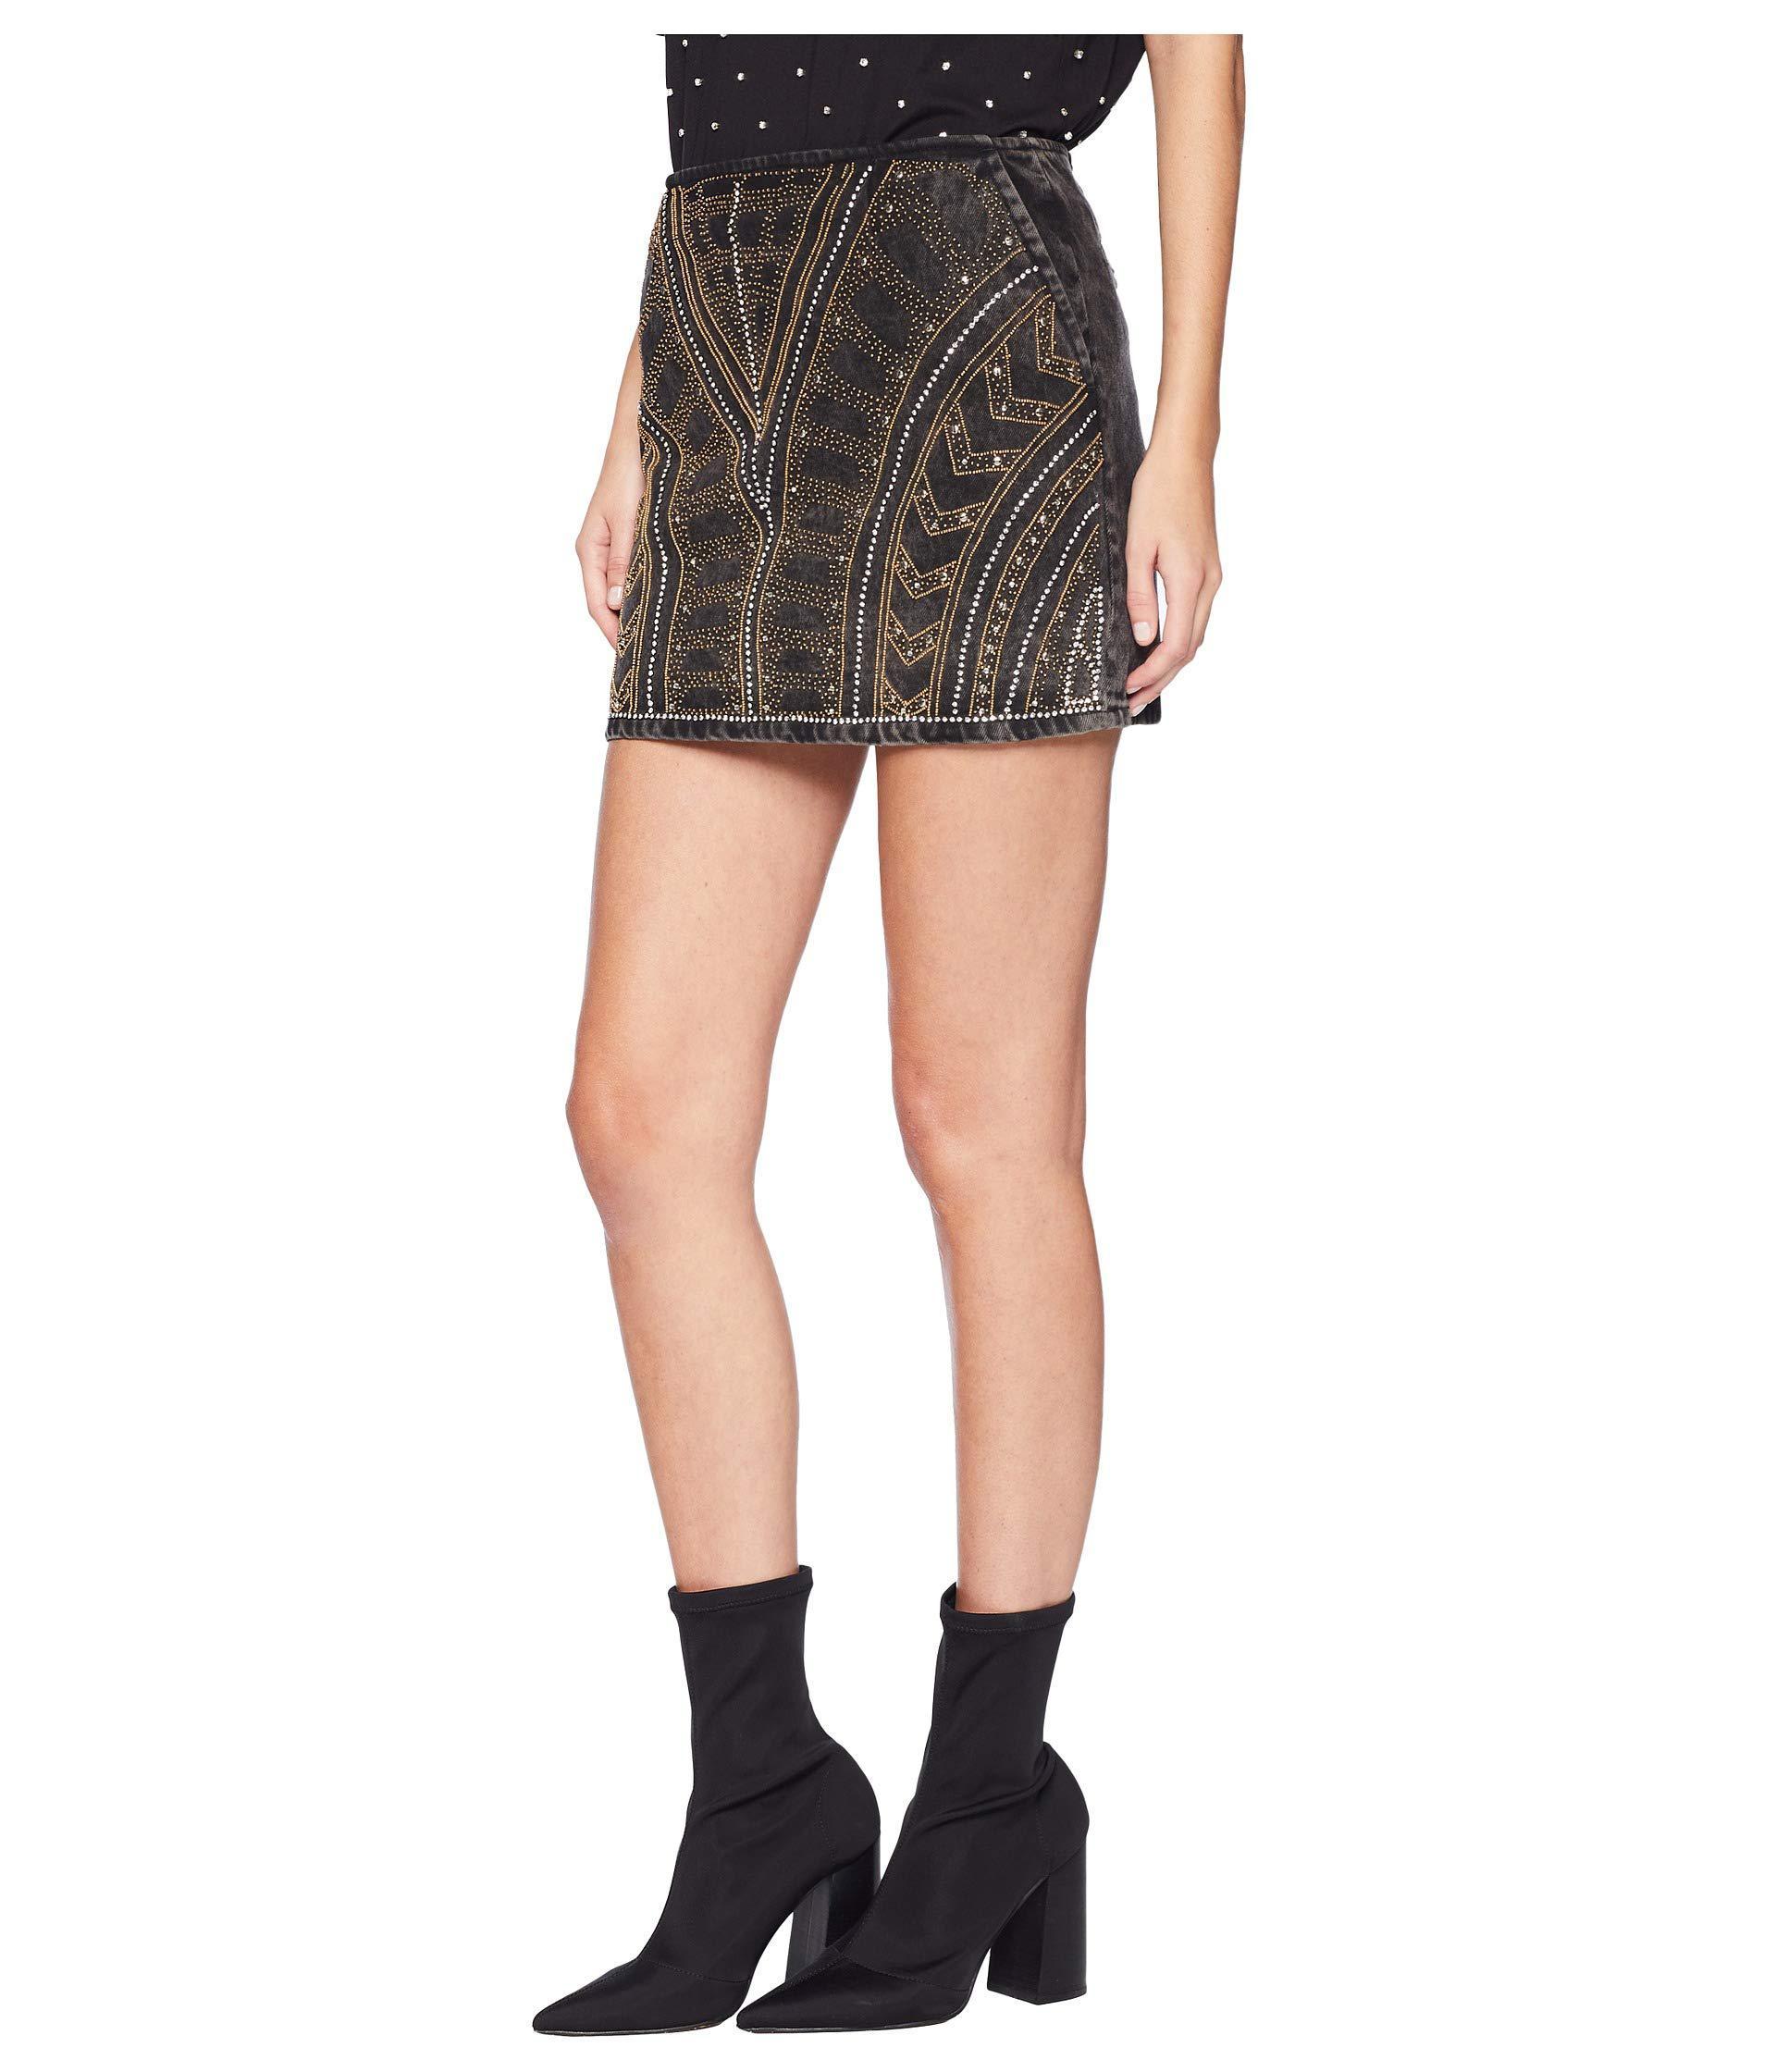 Lyst - The Kooples Embroidered Denim Skirt (black) Women s Skirt in Black f82f470f8d